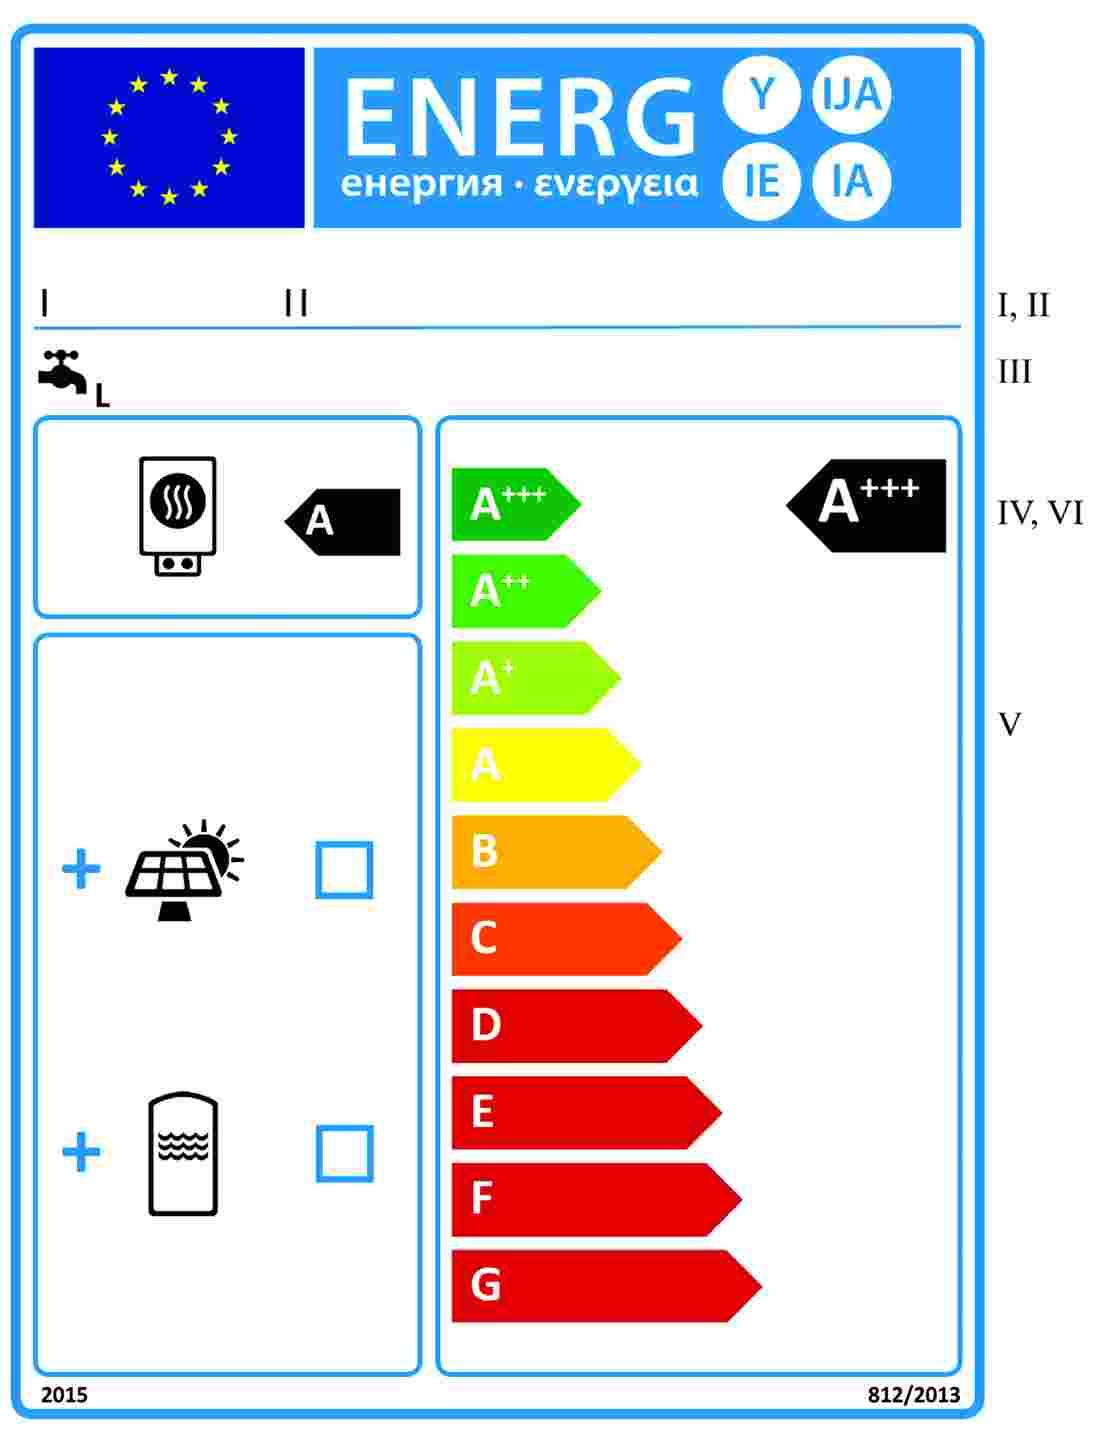 EUR-Lex - 32013R0812 - EN - EUR-Lex